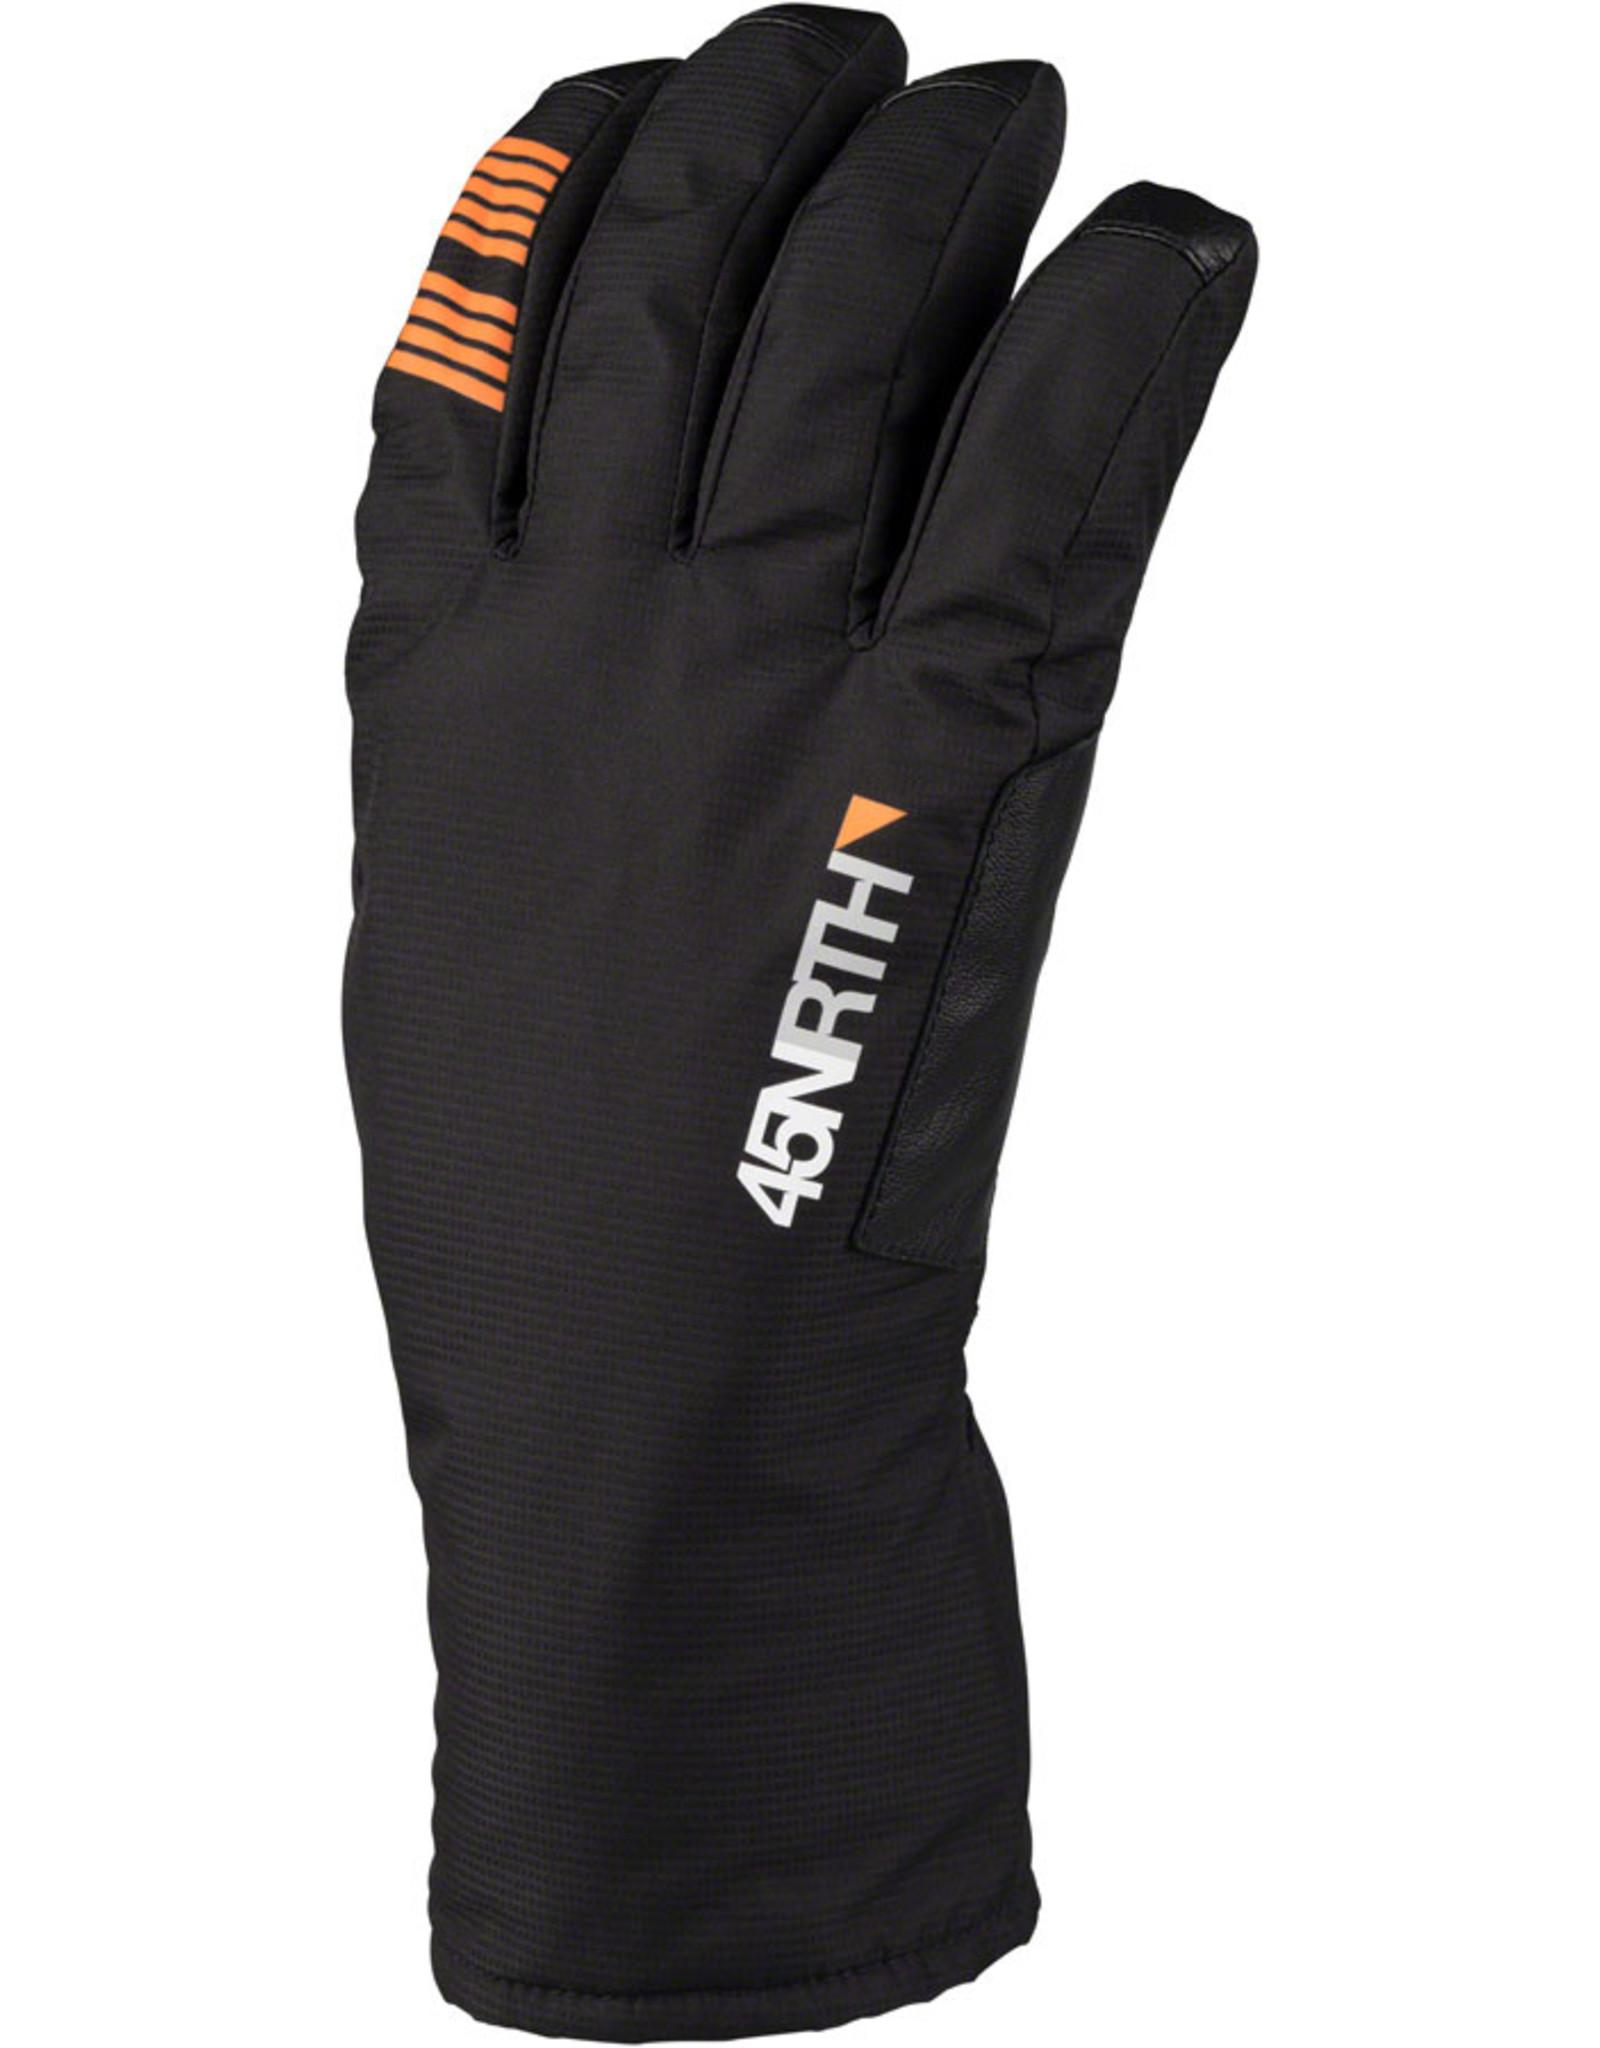 45NRTH 45NRTH Sturmfist 5 Finger Glove: Black LG (9)